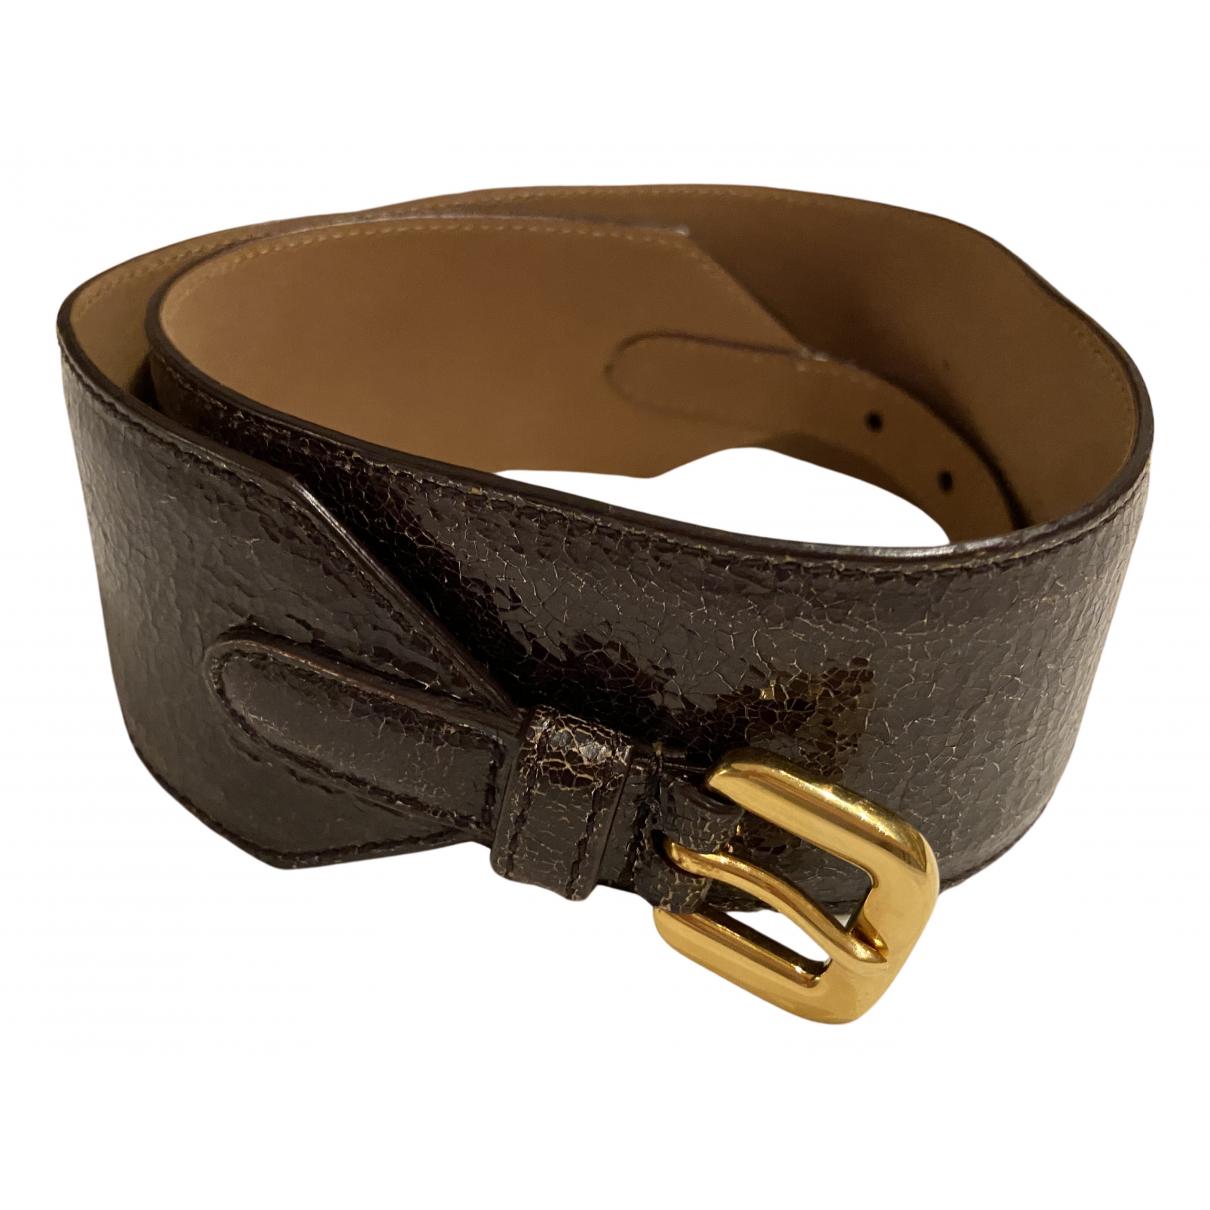 Prada N Brown Leather belt for Women 70 cm